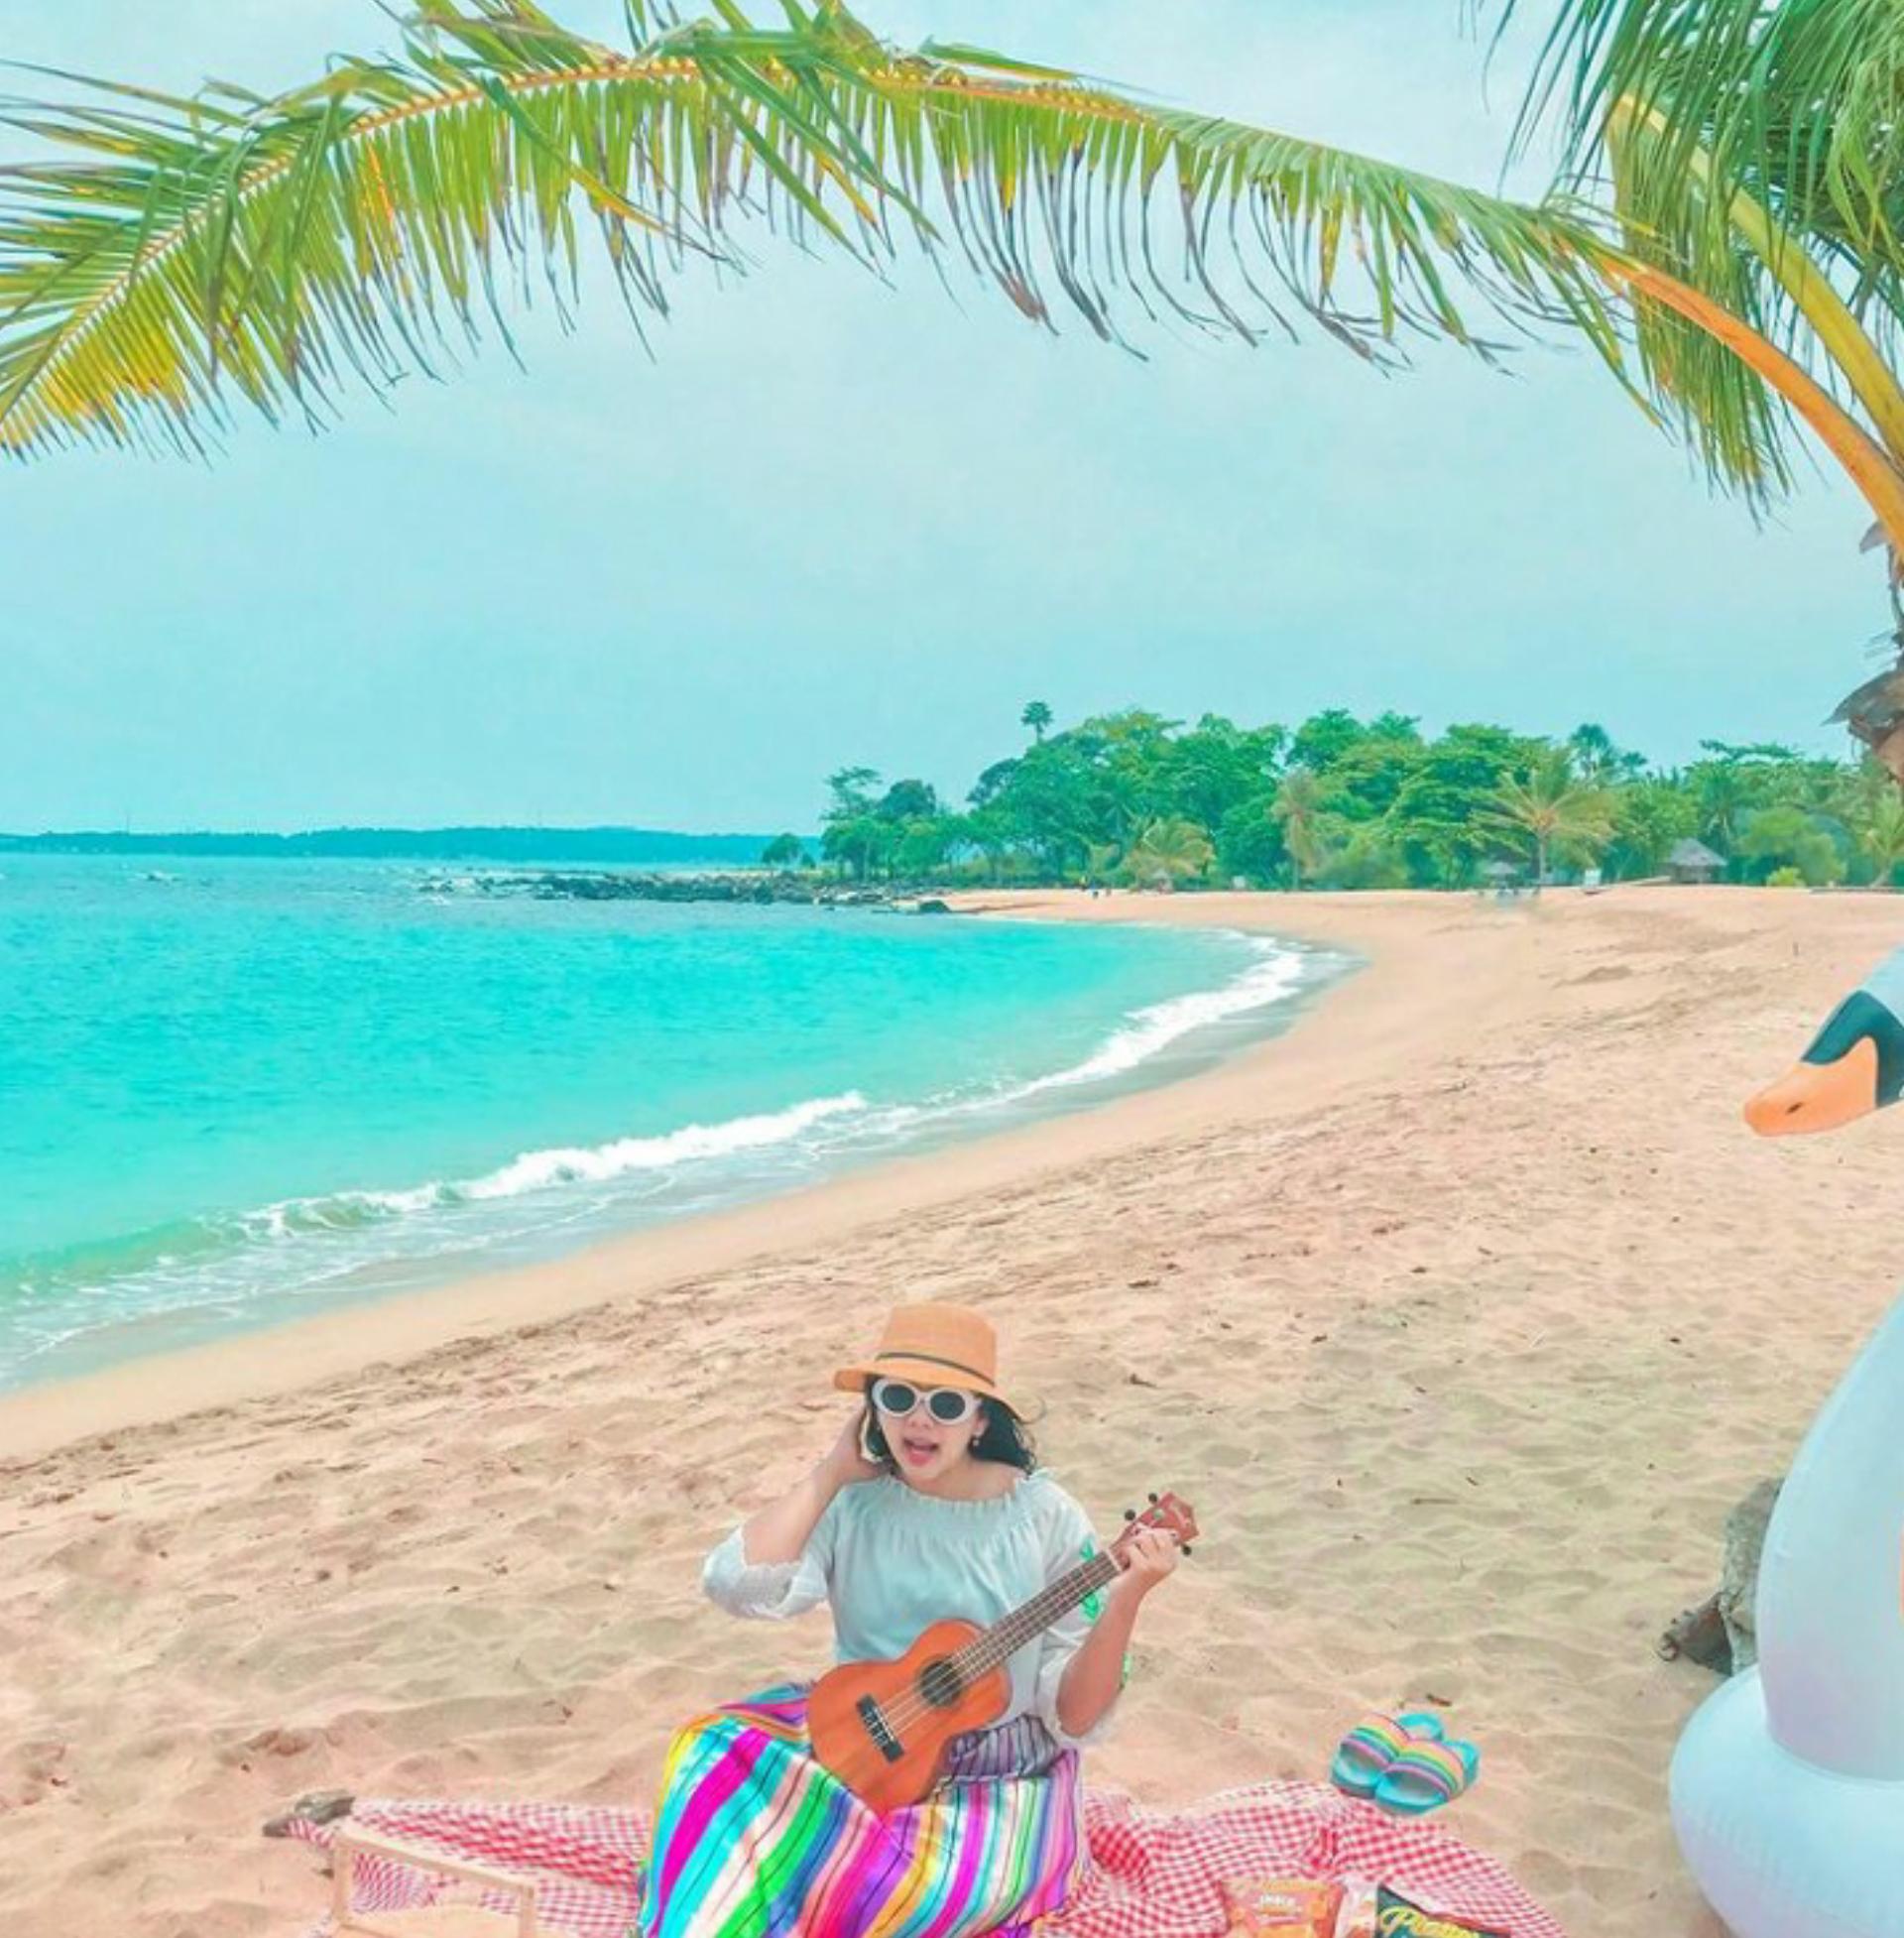 Harga tiket masuk Pantai Alau Alau Boutique Resort kalianda